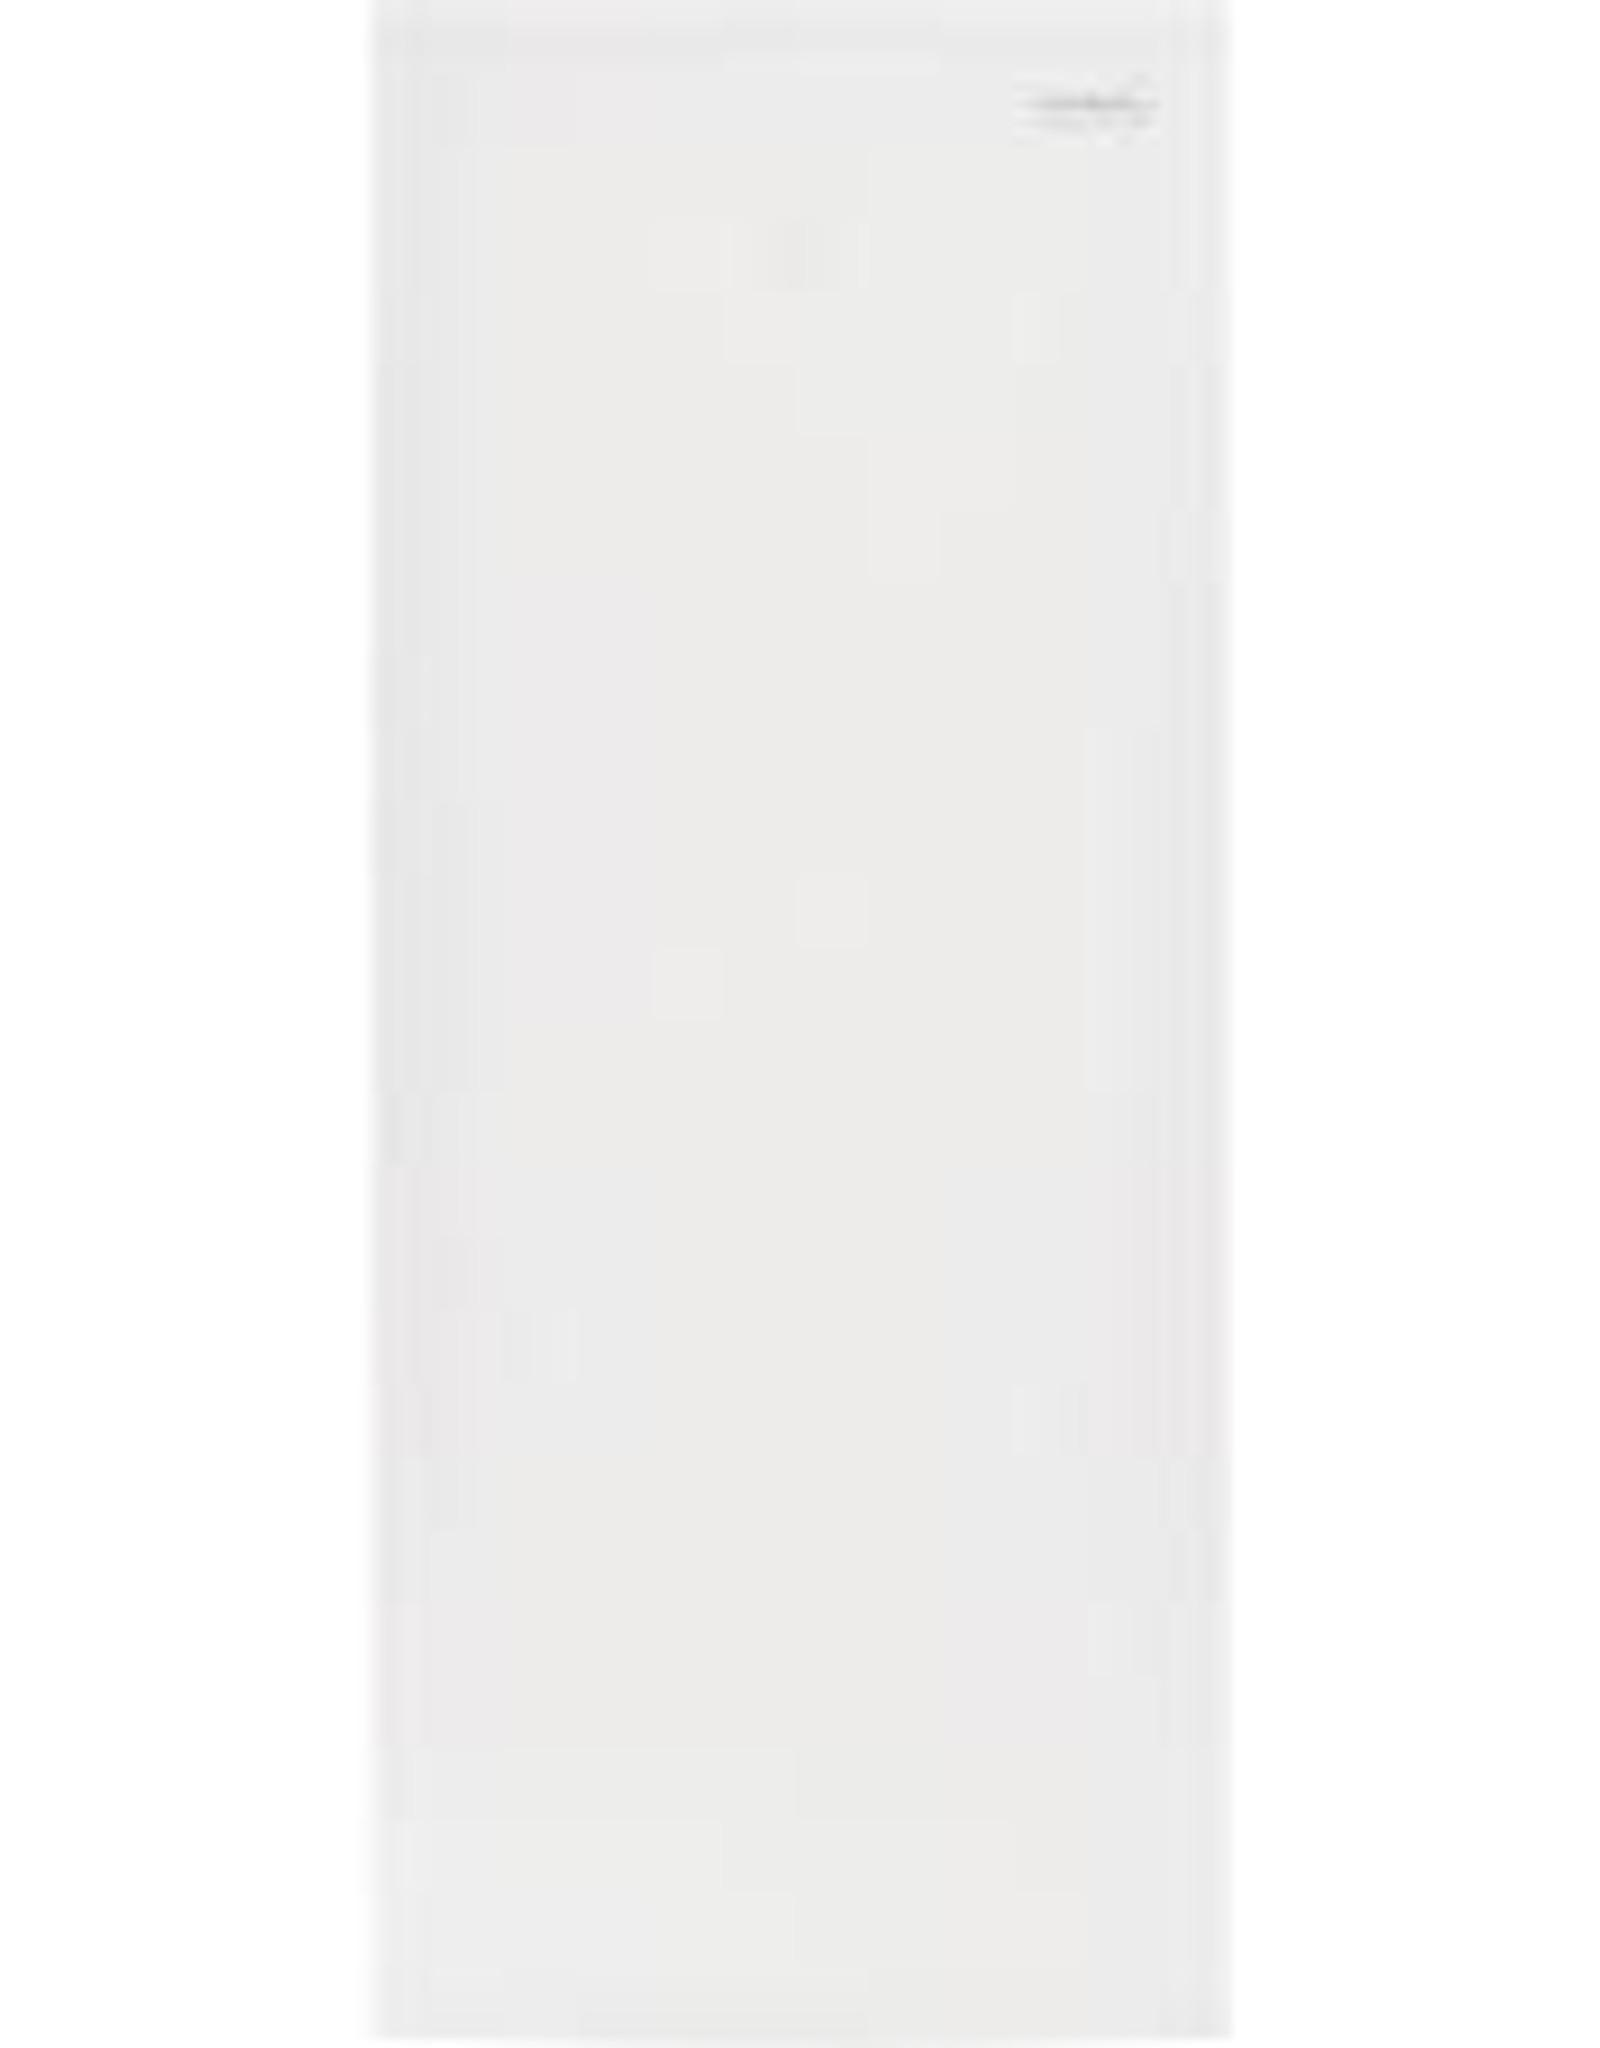 Frigidaire 13cft Upright Freezer